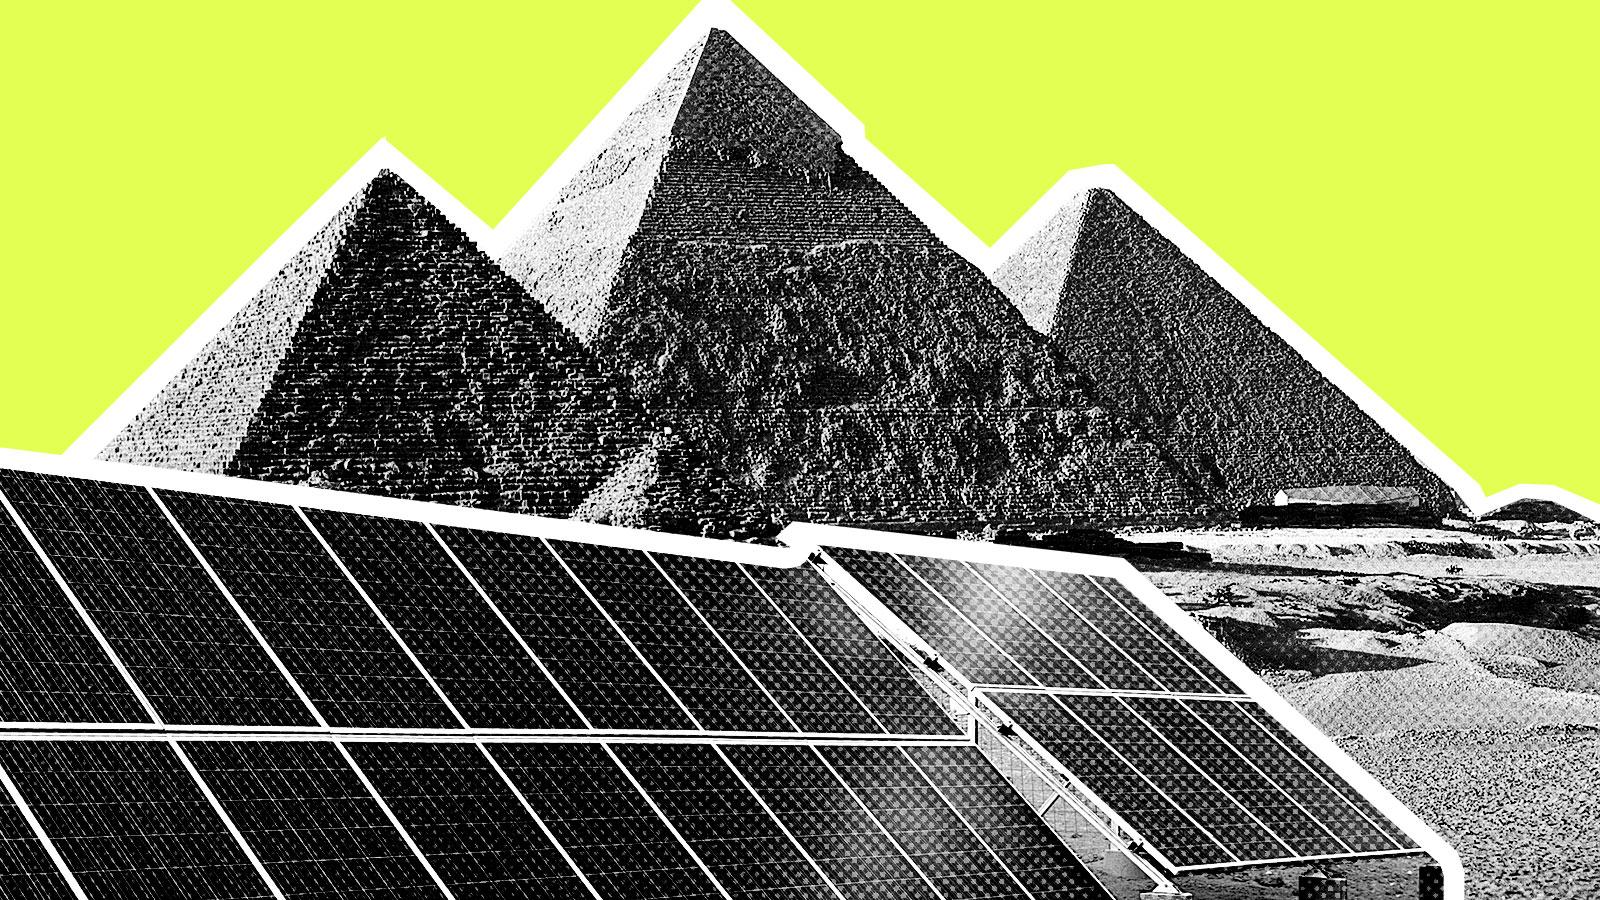 Egypt is building a huge solar farm in the desert